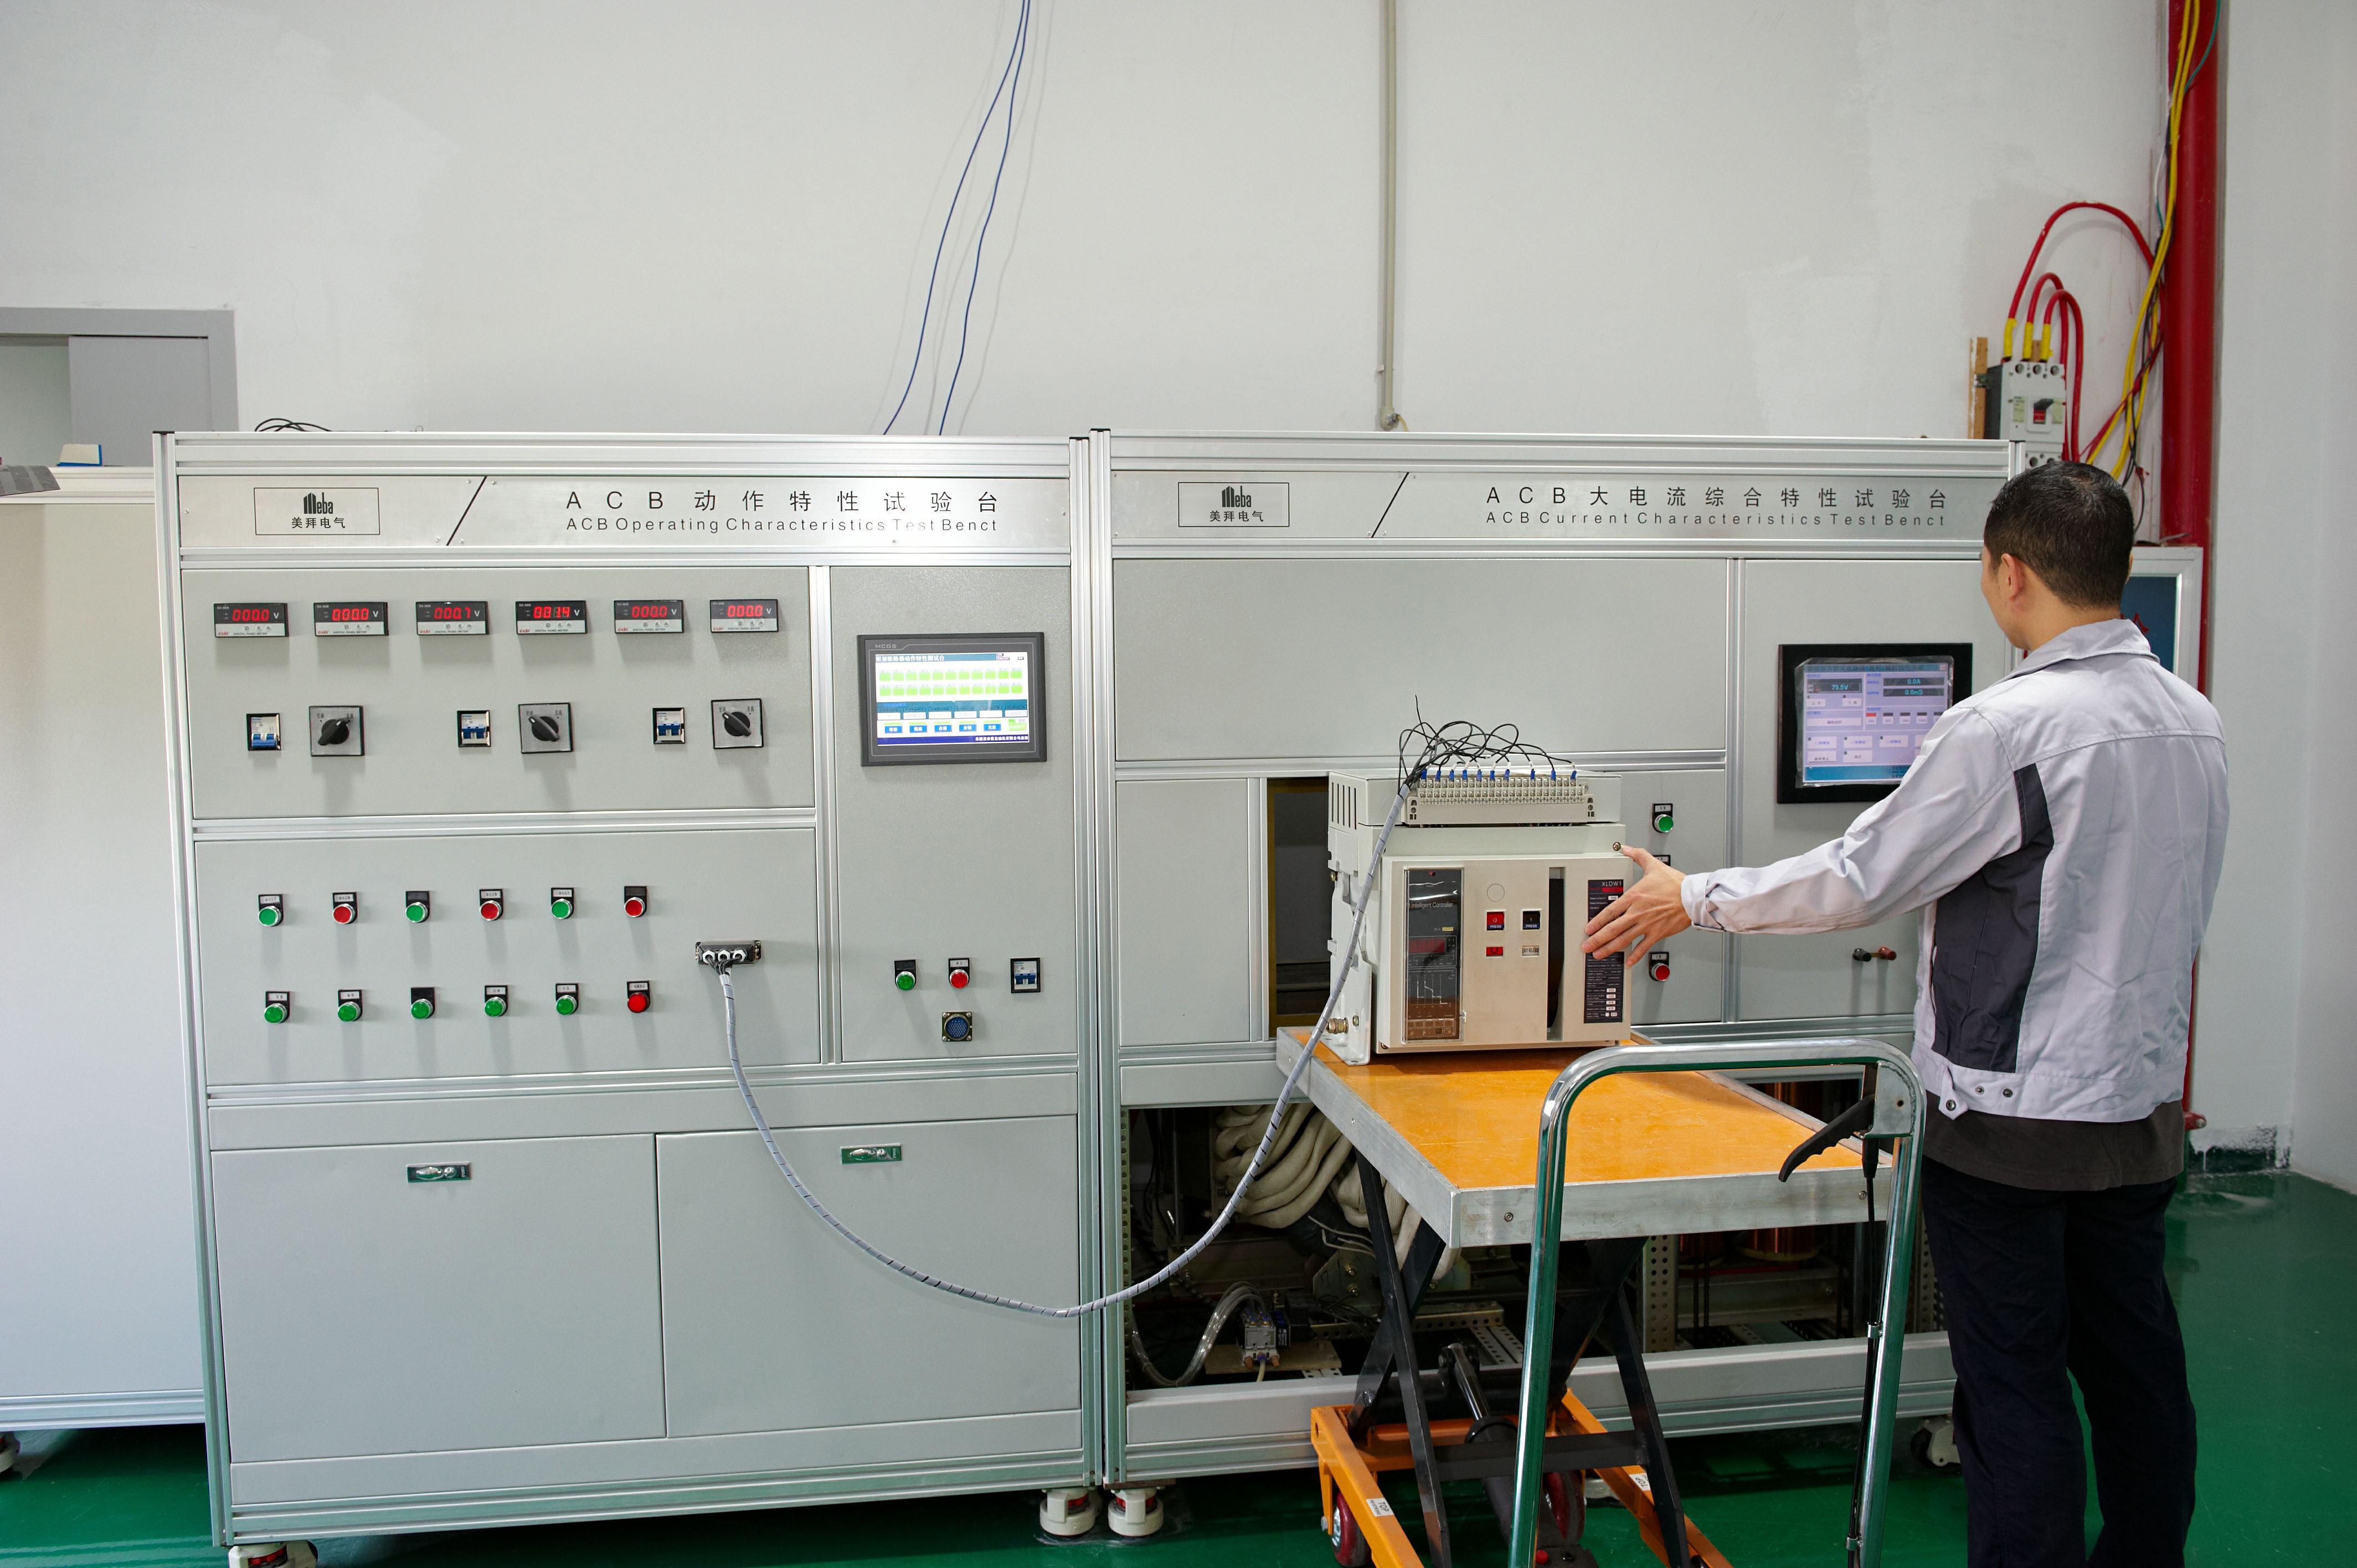 Electric Breaker Acb Wiring Test Machine